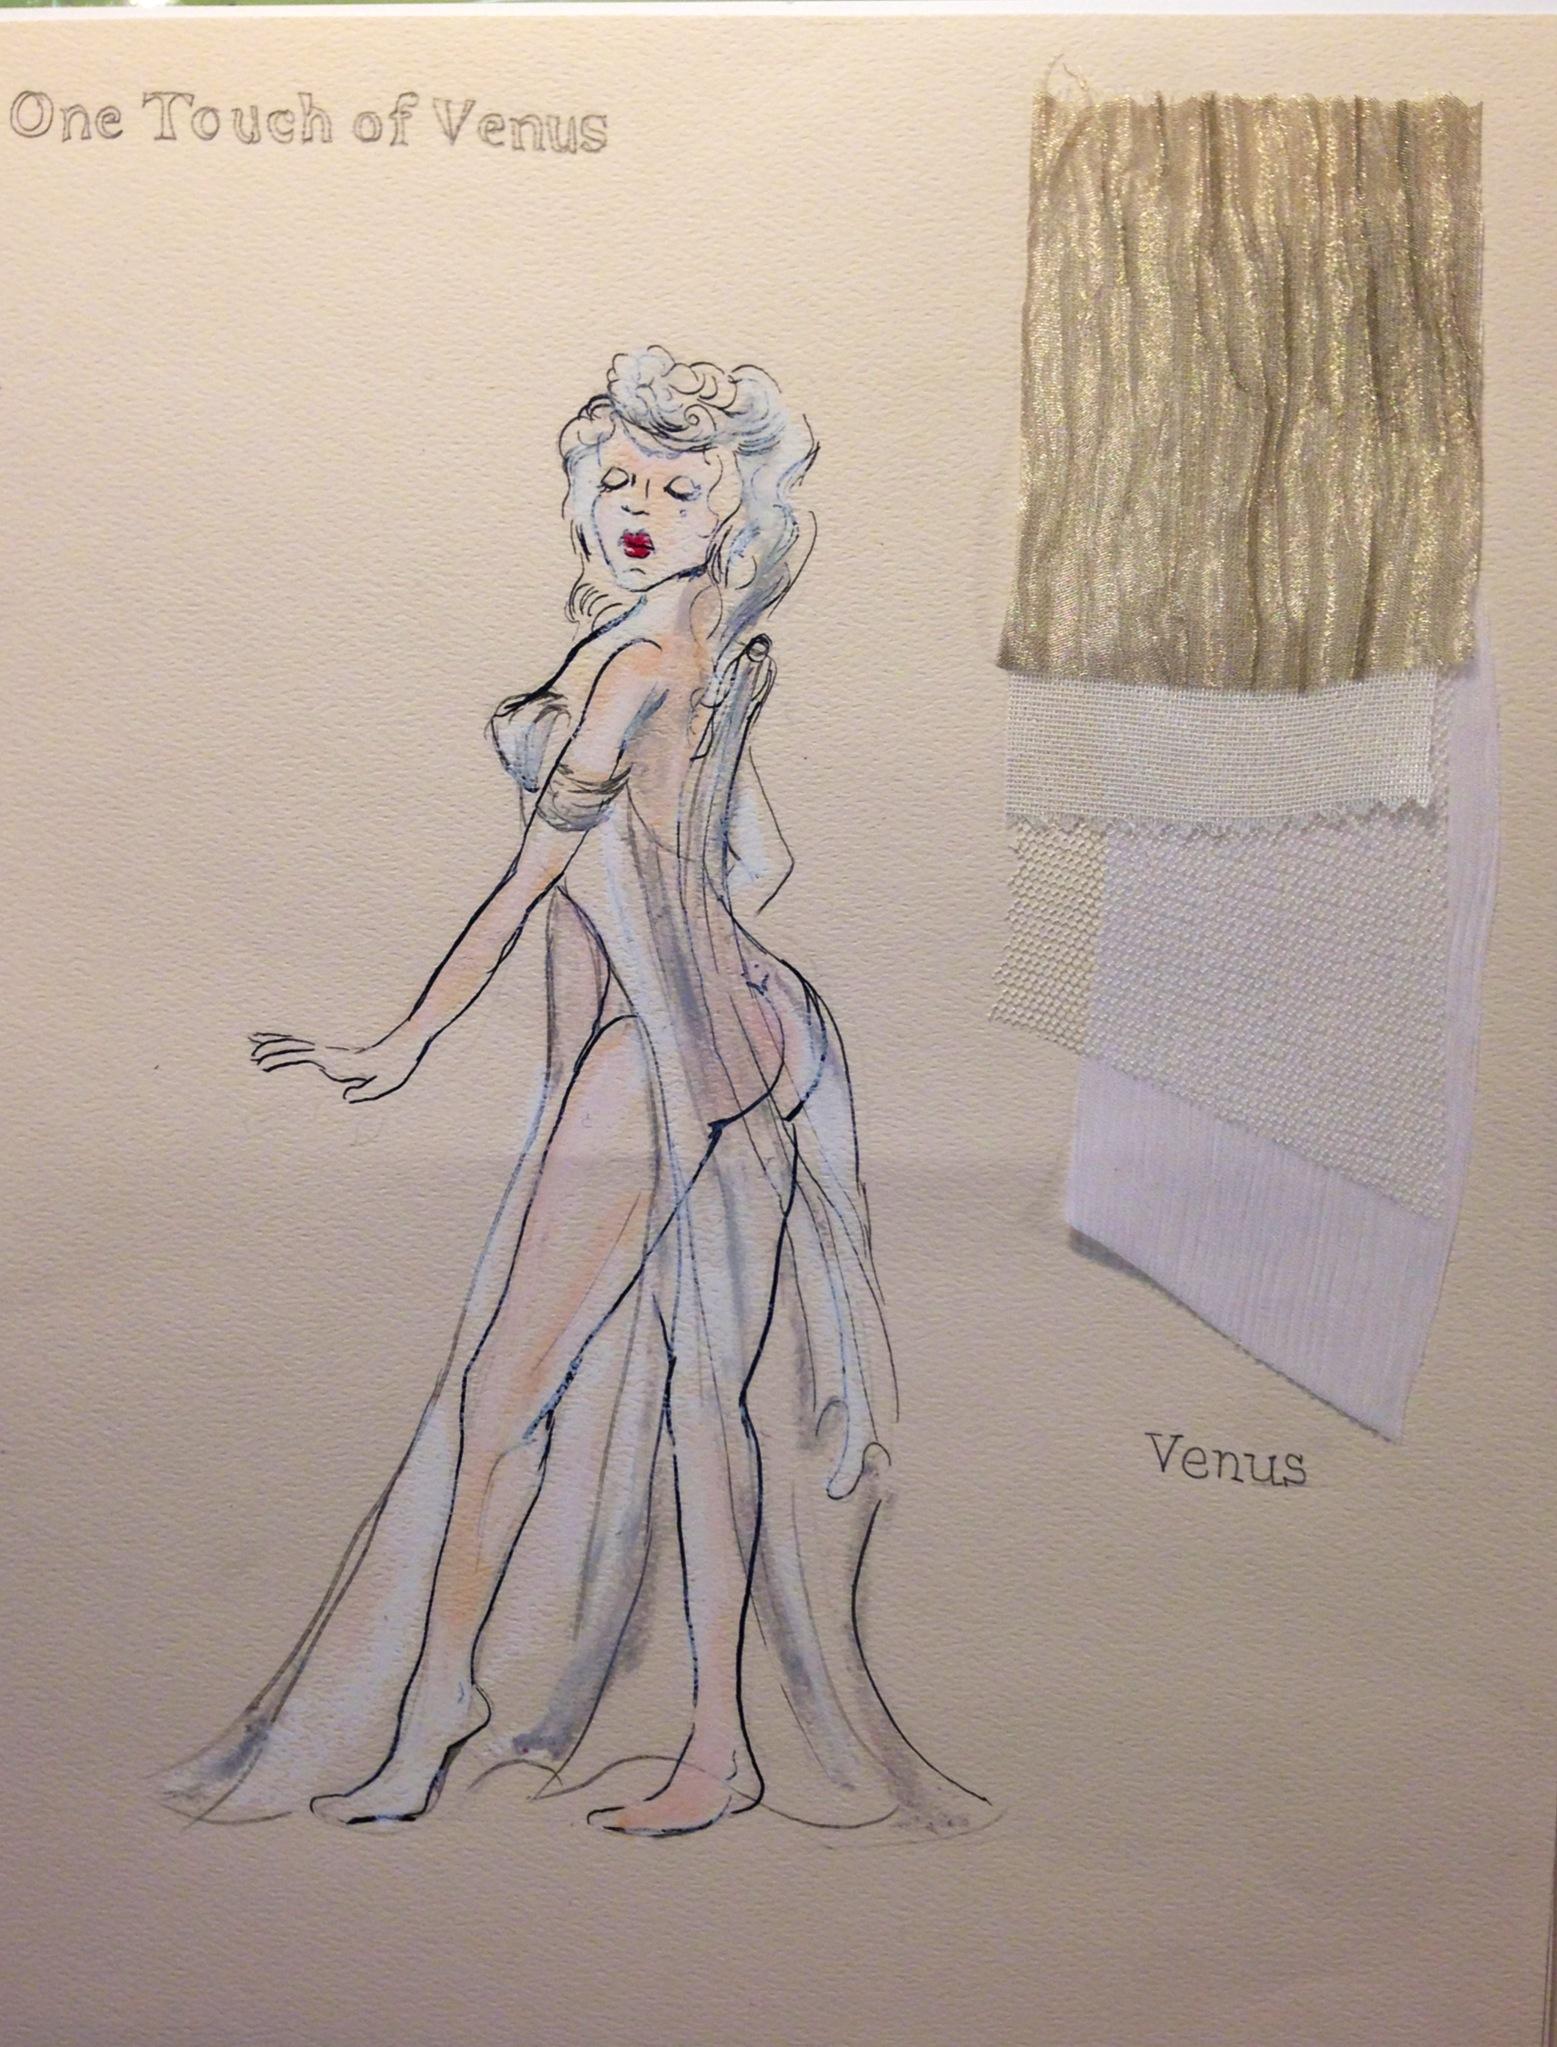 Venus as Statue